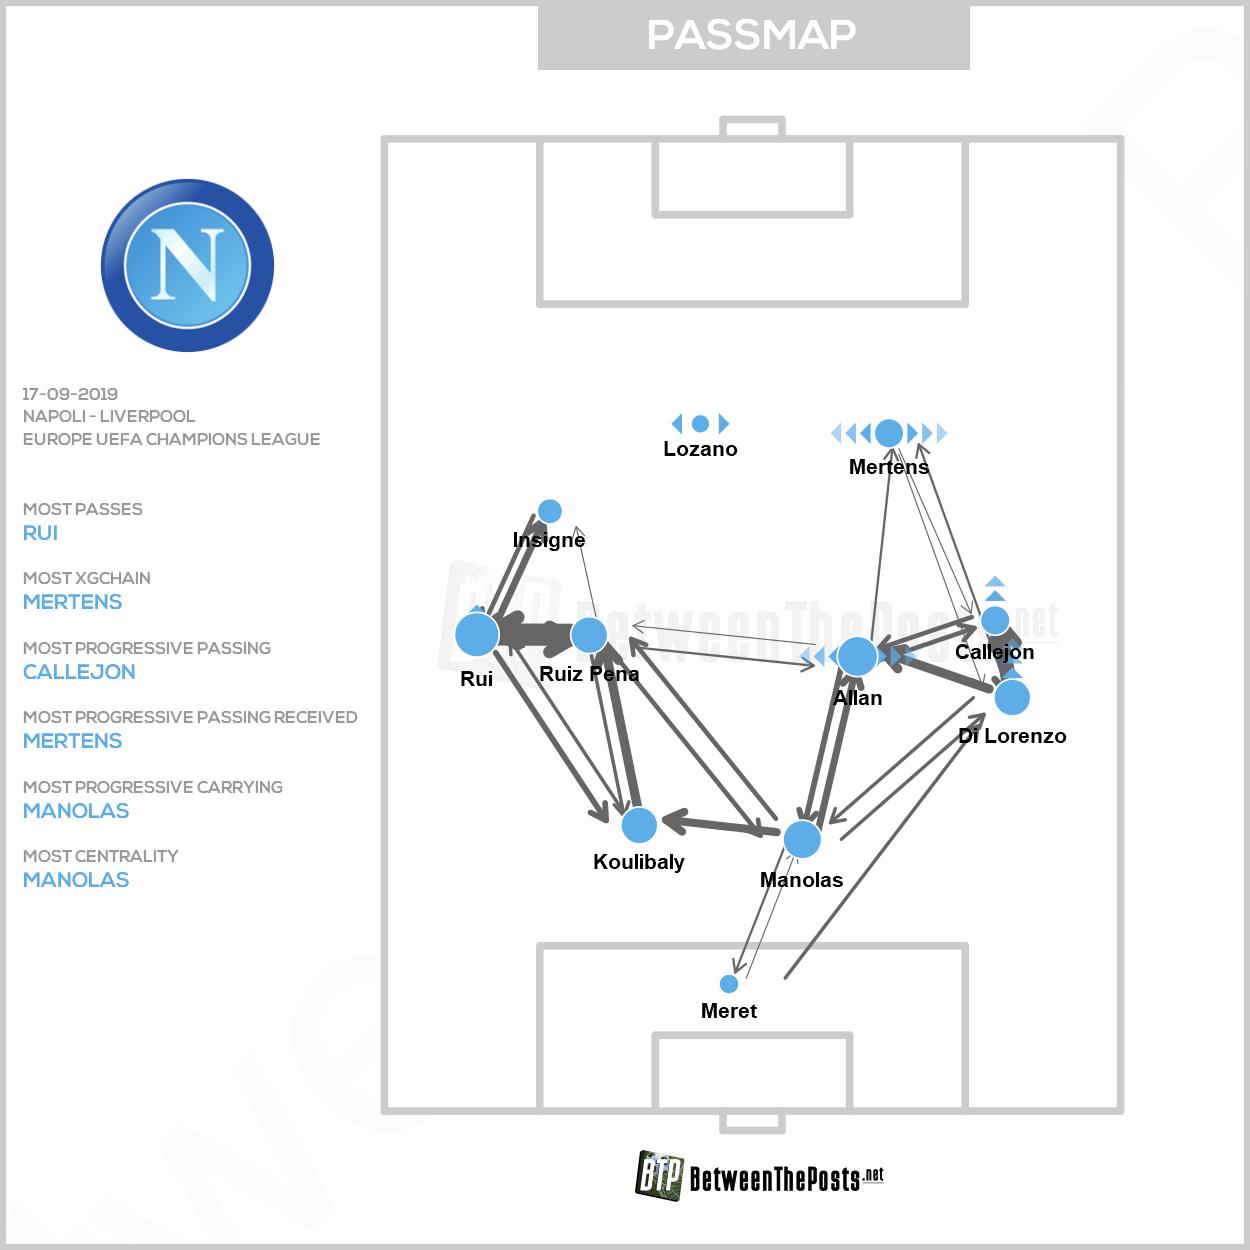 Passmap Napoli Liverpool 2-0 Champions League